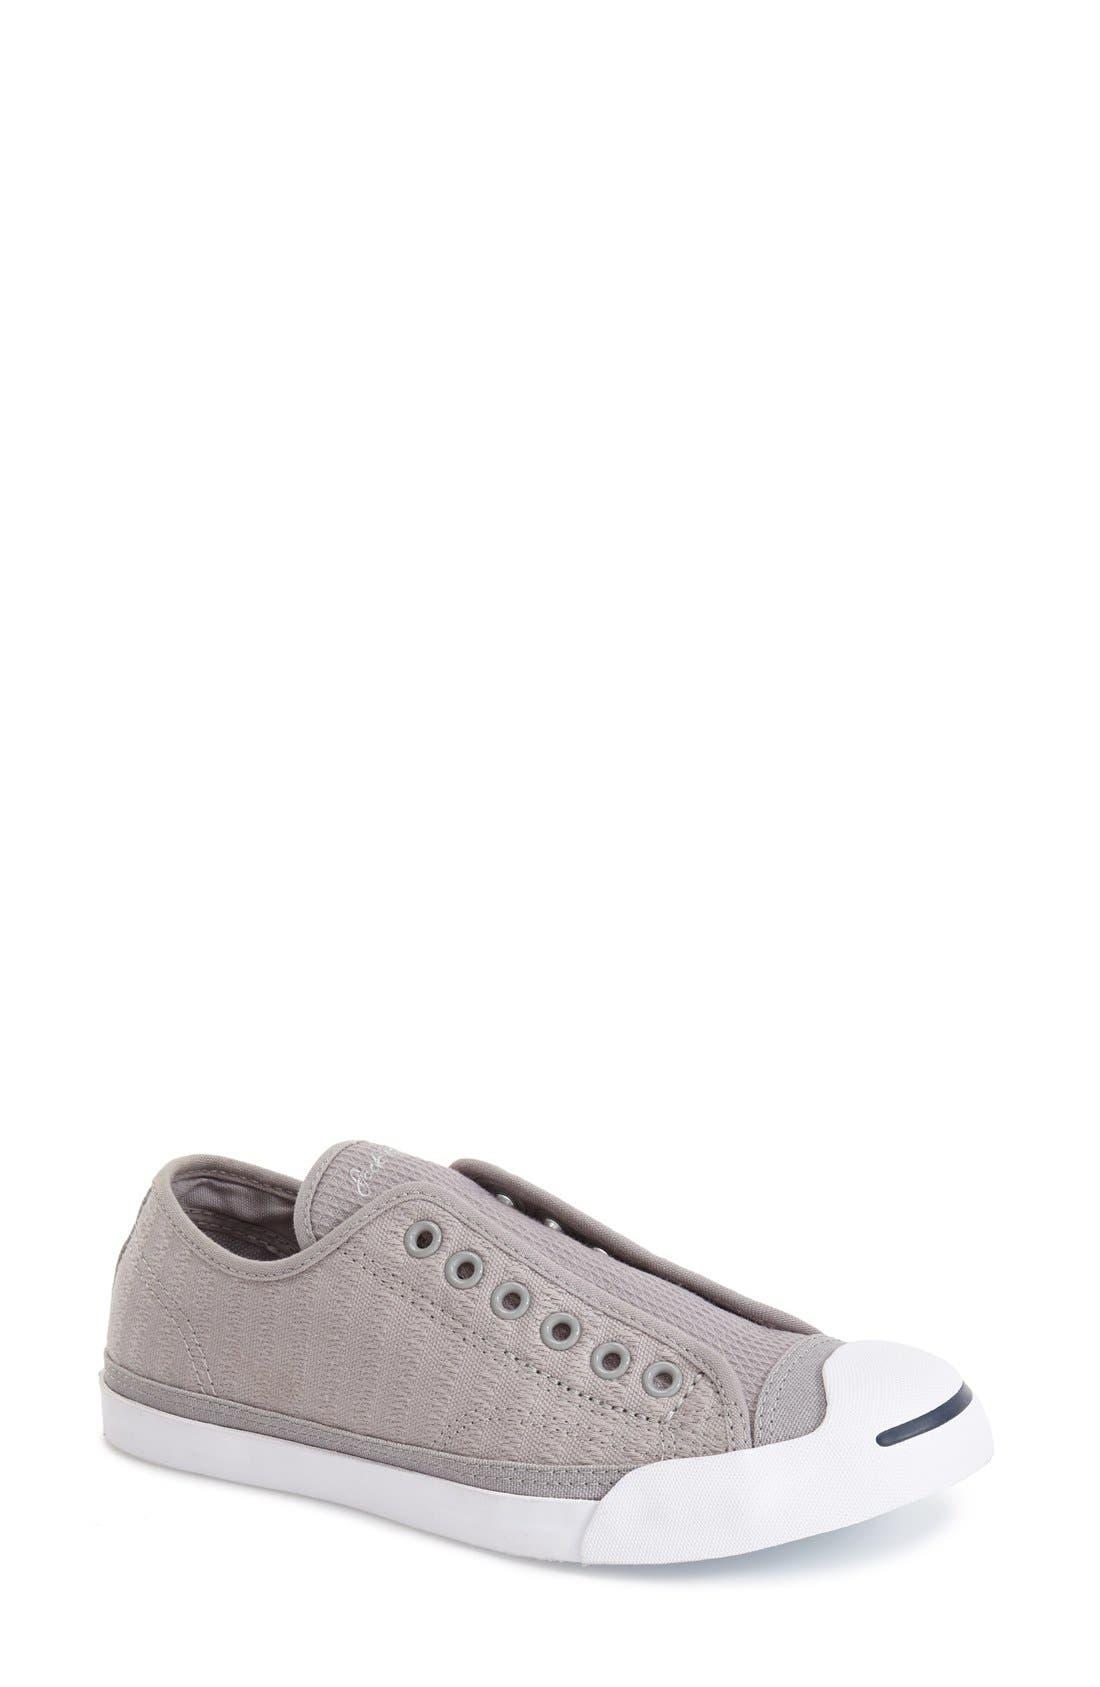 'Jack Purcell' Garment Dye Low Top Sneaker,                             Main thumbnail 2, color,